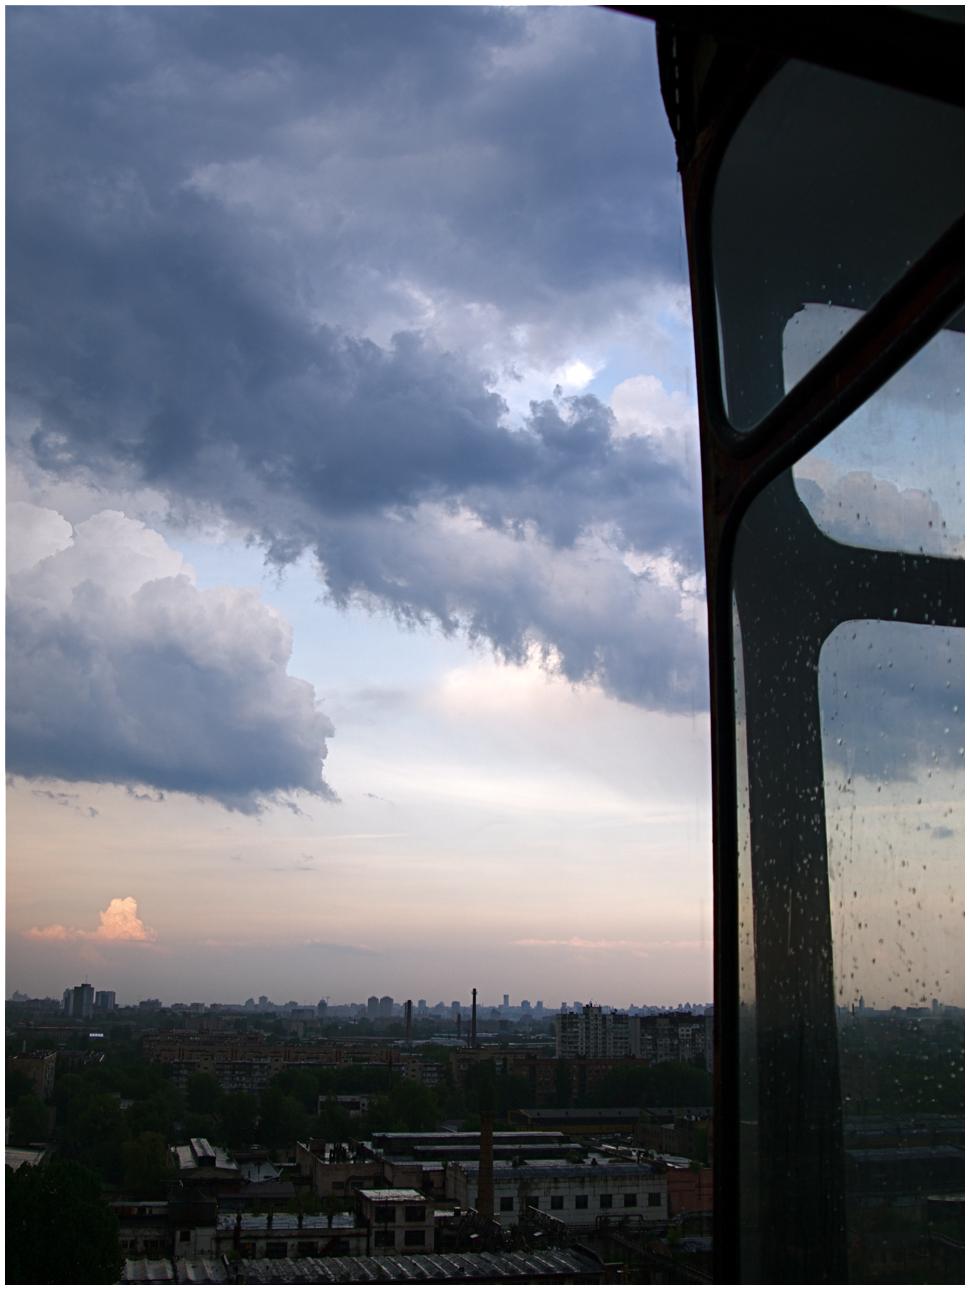 Storm in Kyiv